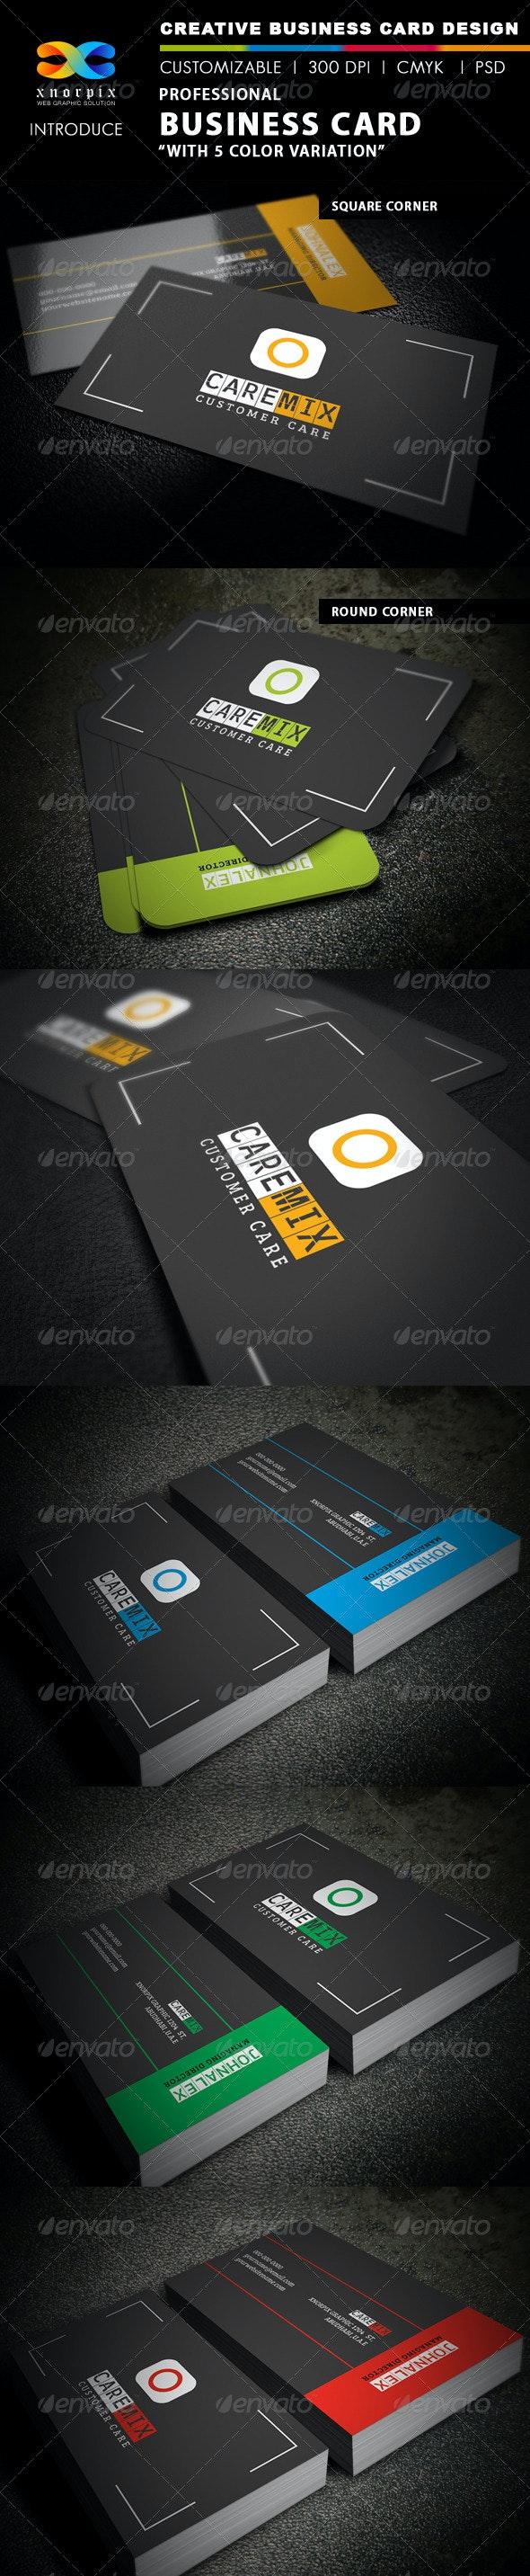 Customer Care Business Card - Creative Business Cards